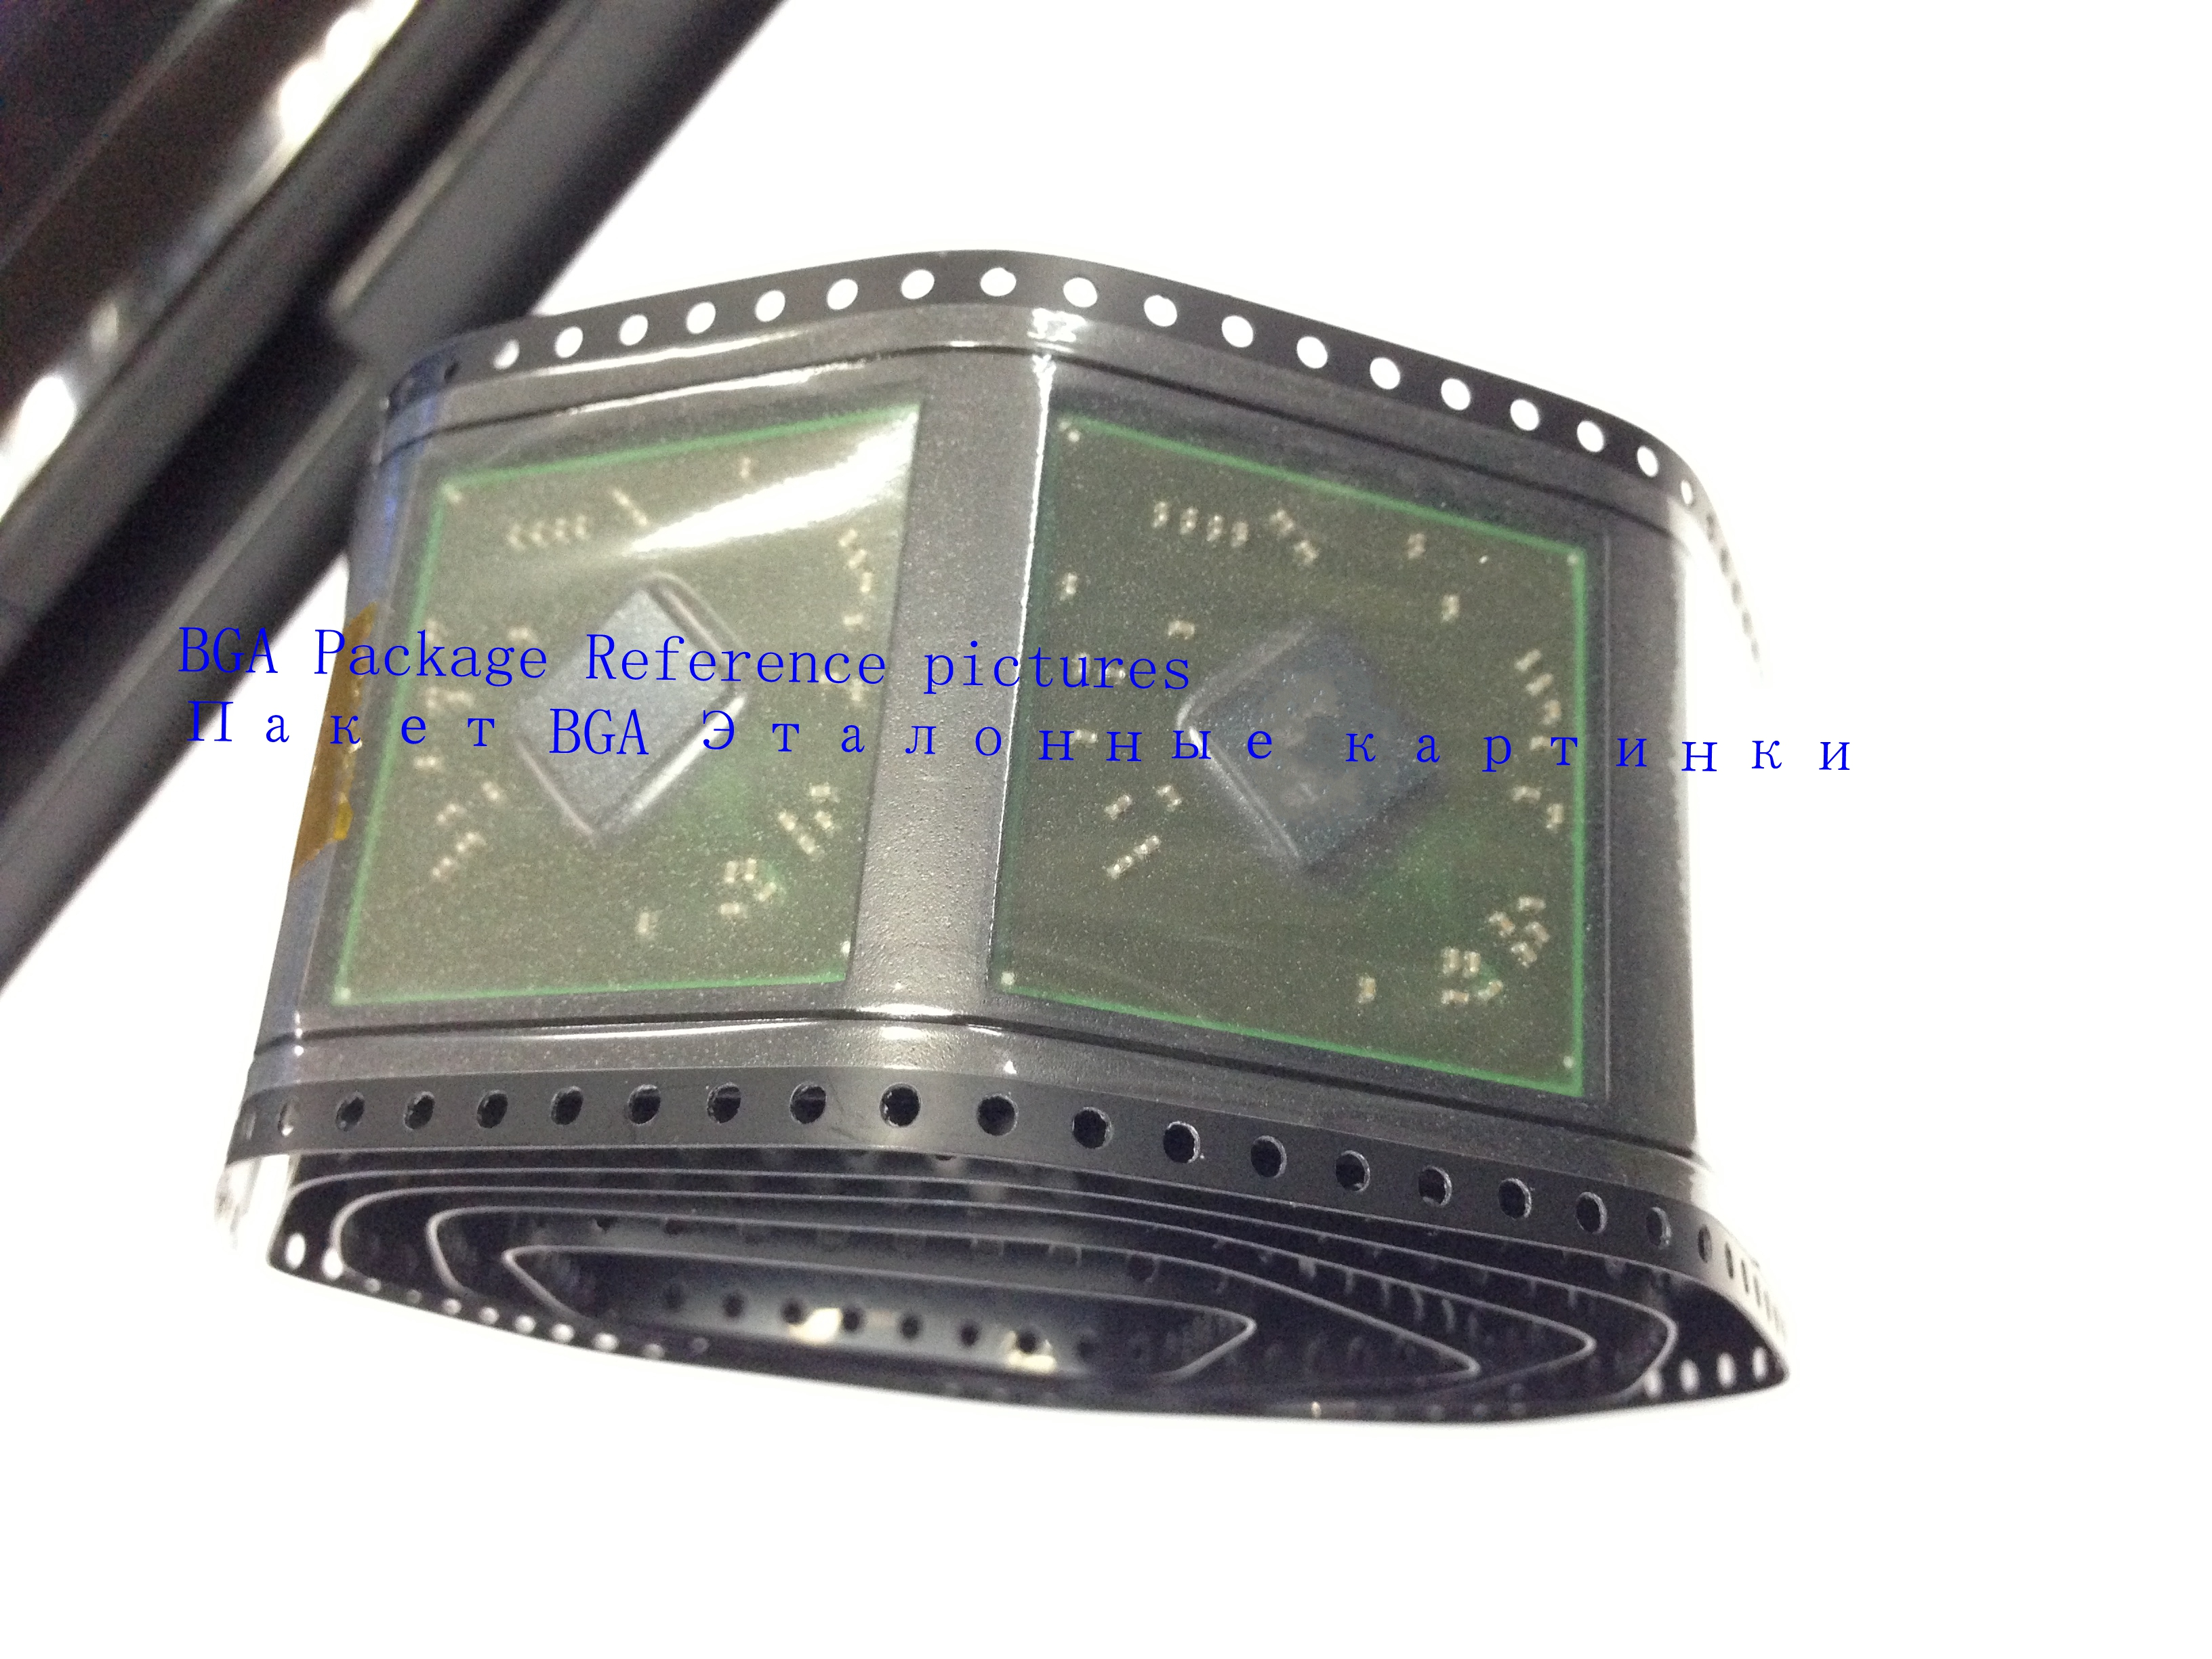 1 pcs/lot 100% Nouveau N13M-GE2-AIO-A1 N13M GE2 AIO A1 Chipset BGA1 pcs/lot 100% Nouveau N13M-GE2-AIO-A1 N13M GE2 AIO A1 Chipset BGA